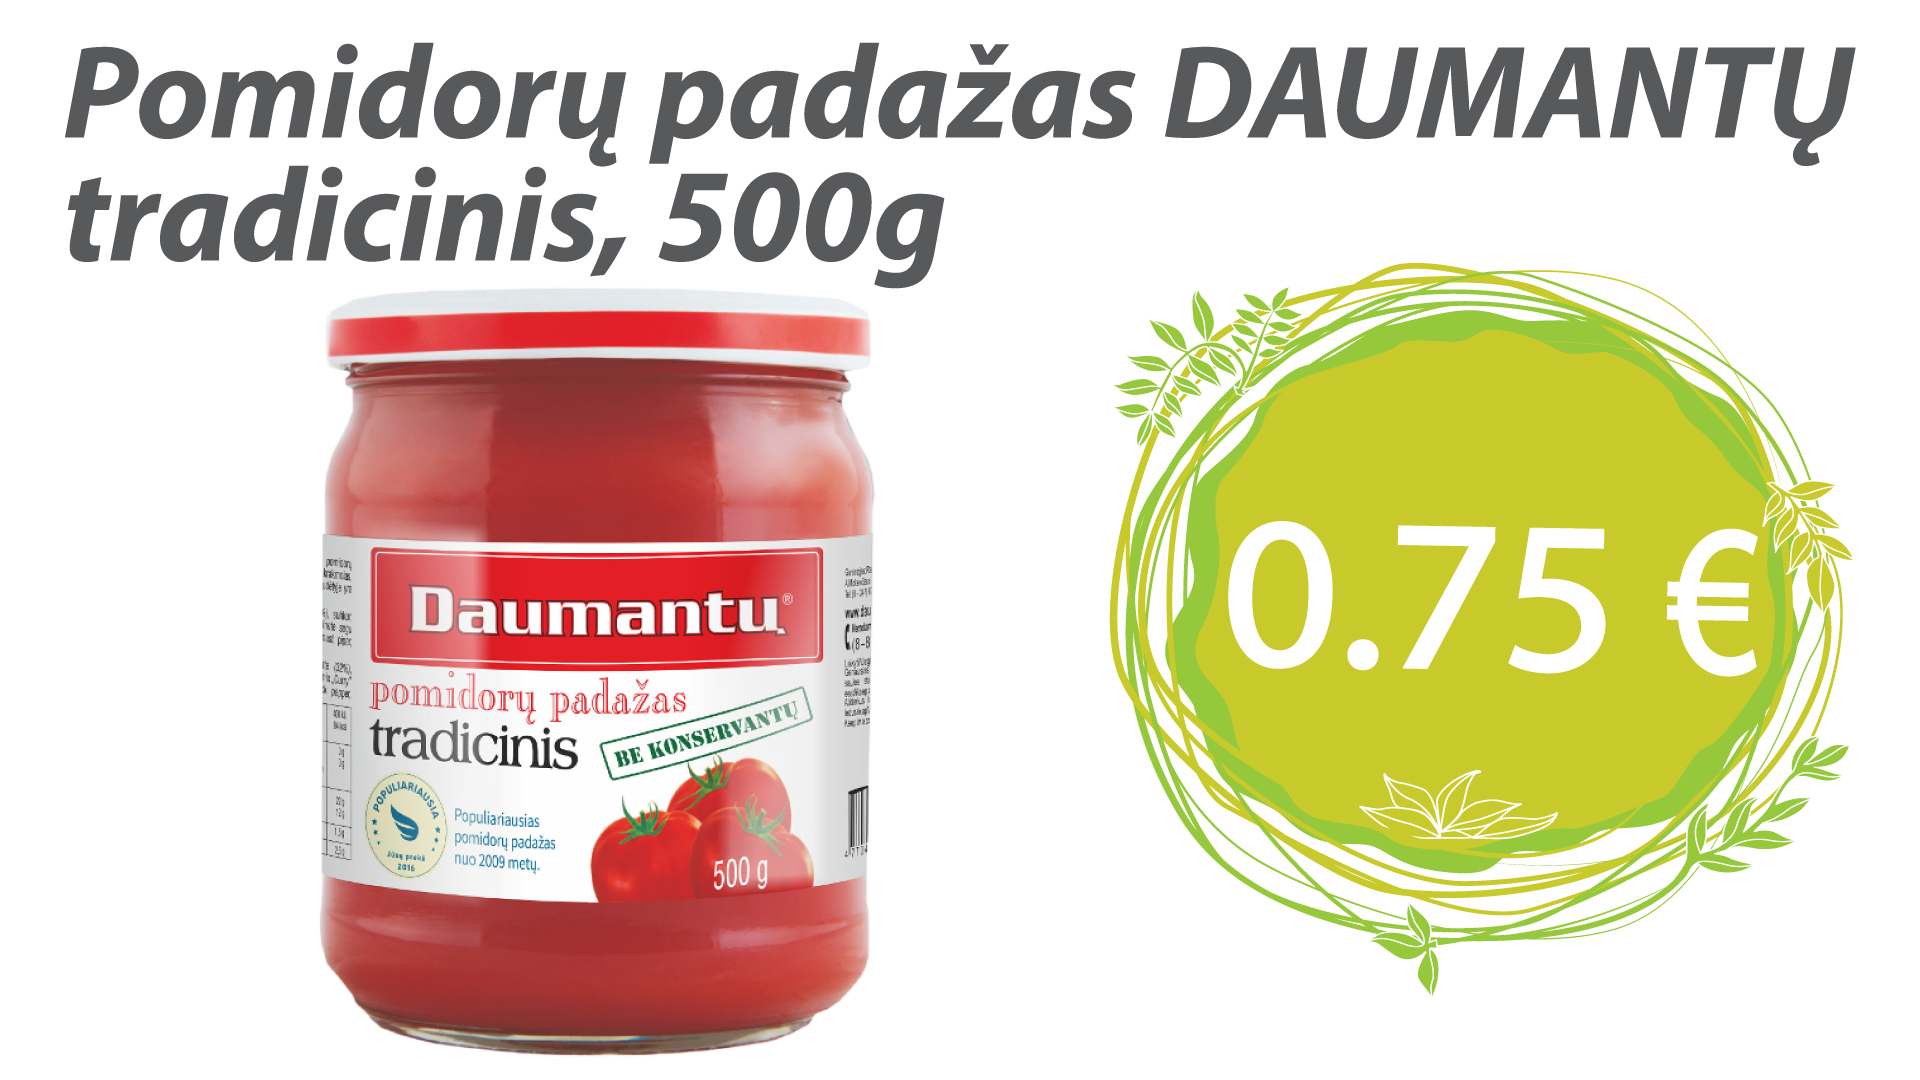 pomidoru-padazas-daumantu-tradicinis